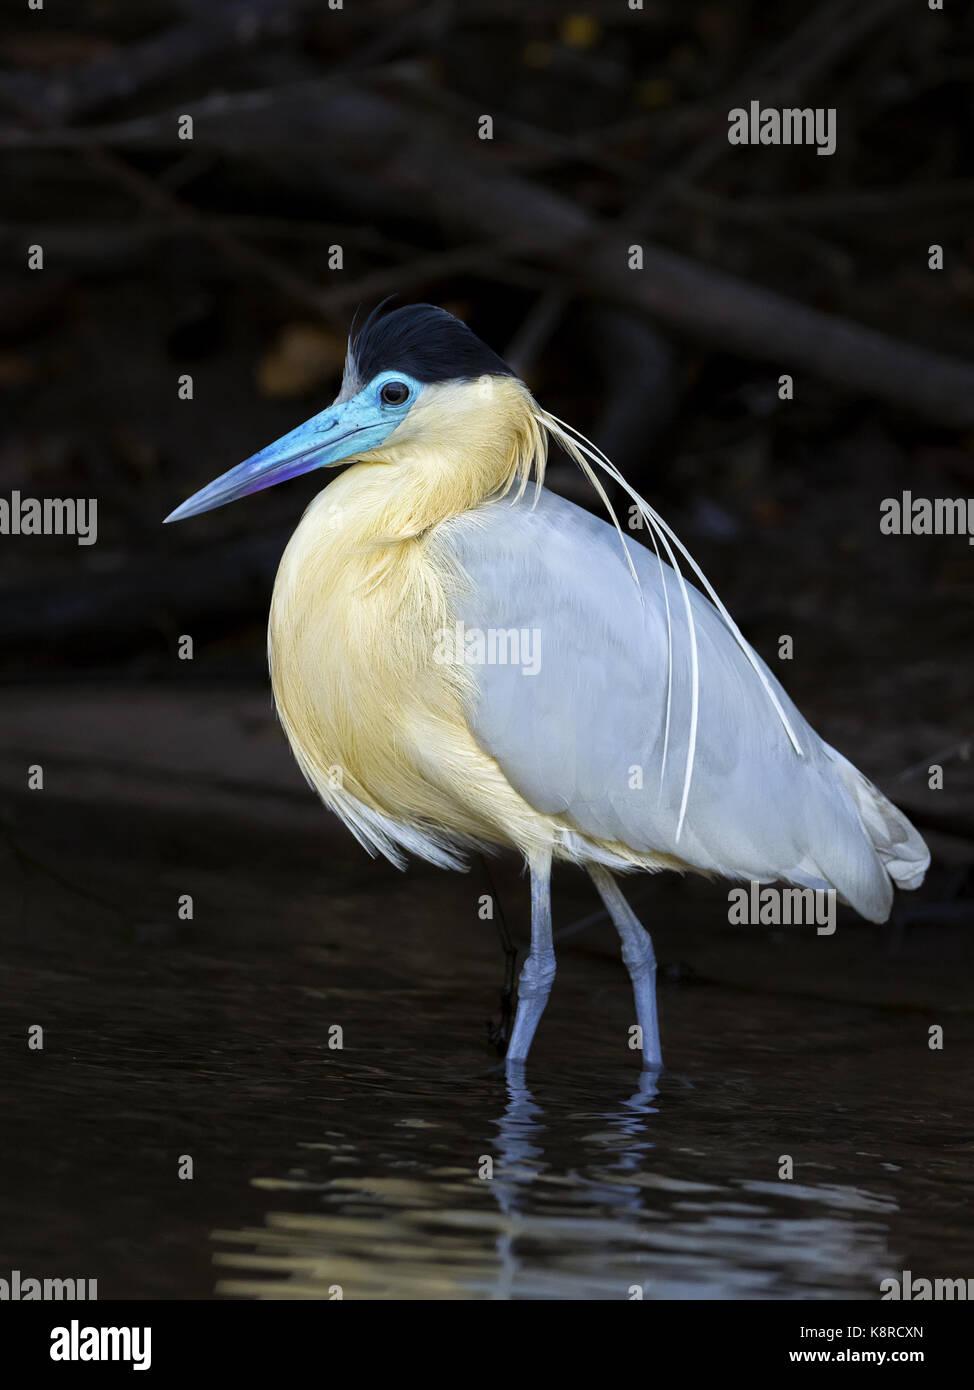 Heron (Pilherodius pileatus begrenzt), Mato Grosso, Brasilien, Juni Stockbild